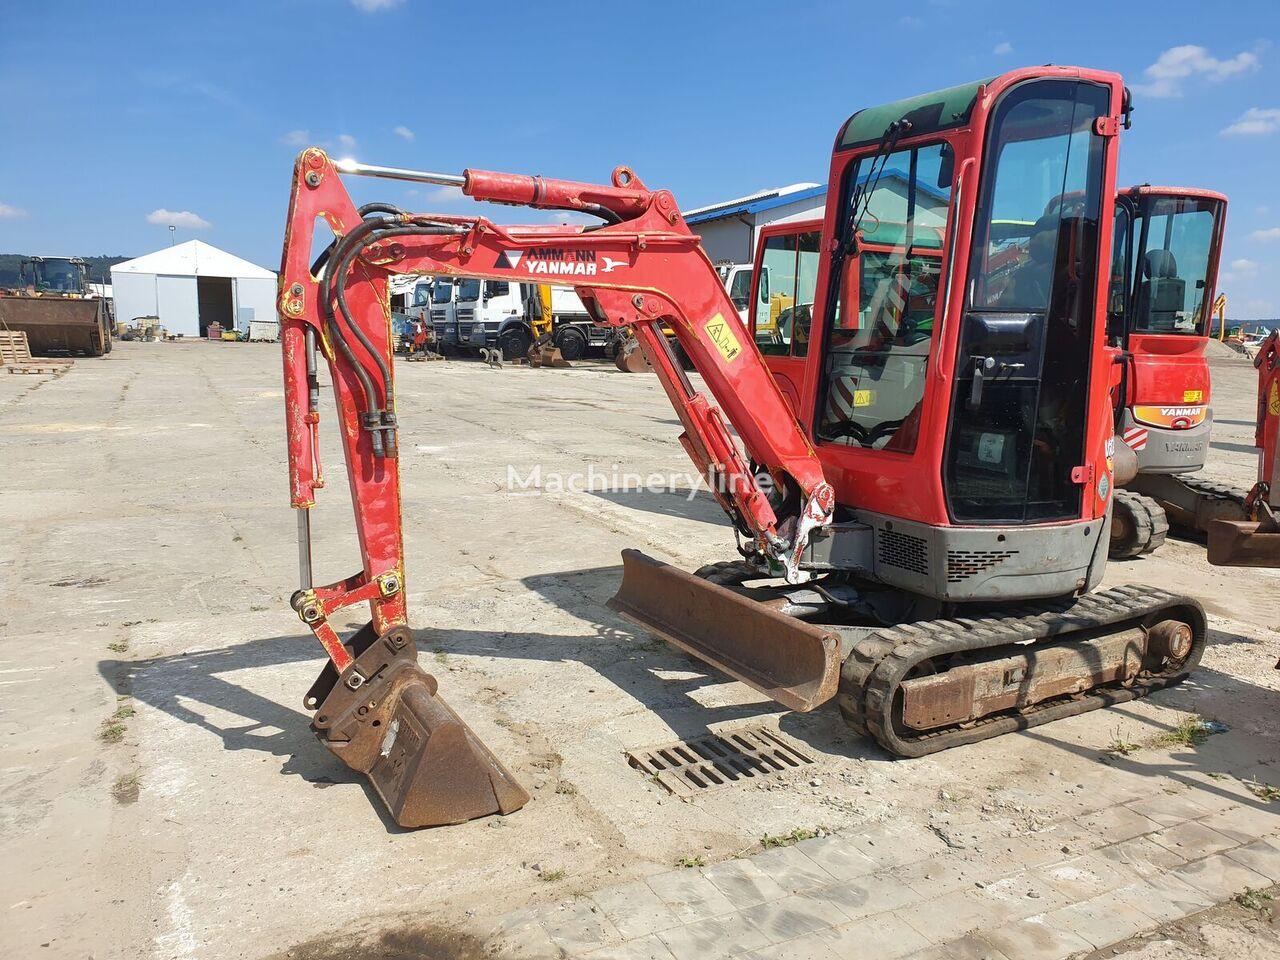 YANMAR Vio20-3 mini excavator